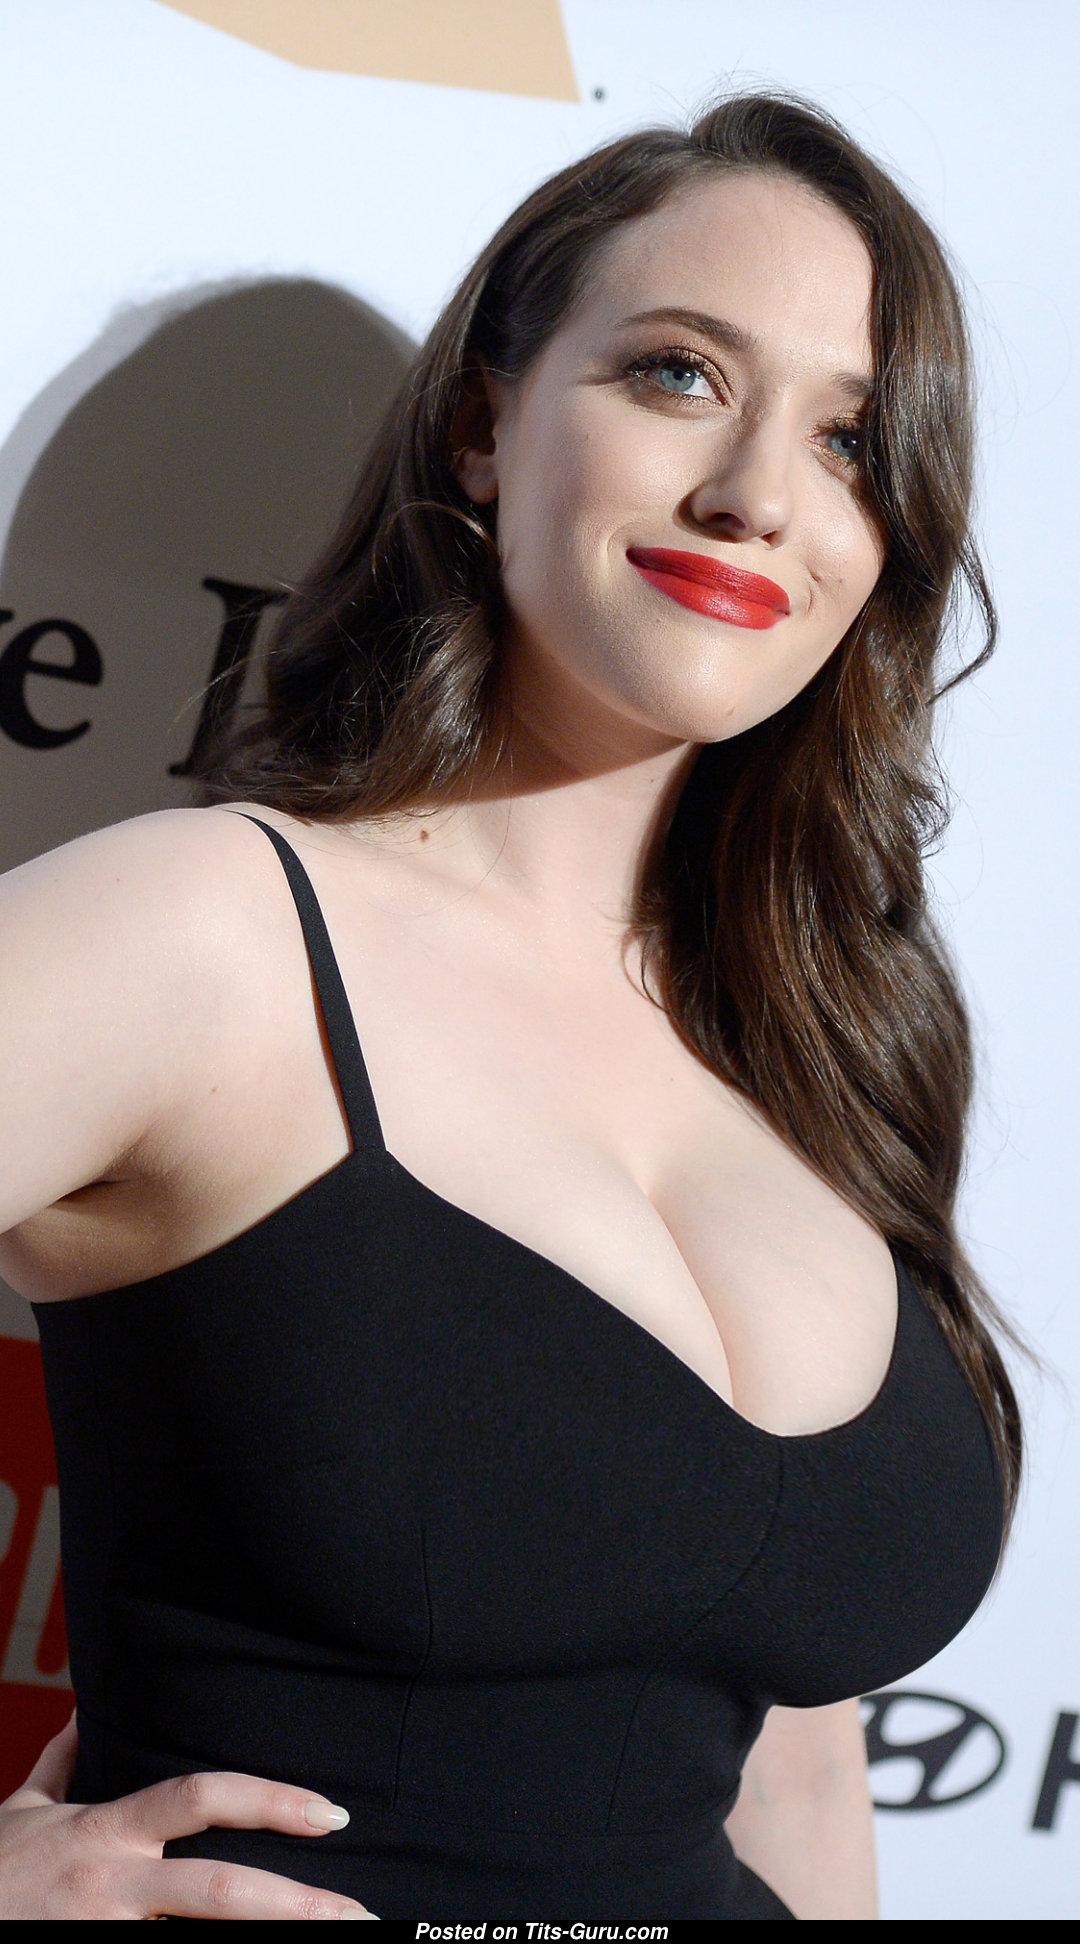 Actress Porn Amateur Natural Tits kat dennings - topless & non-nude brunette babe, girlfriend